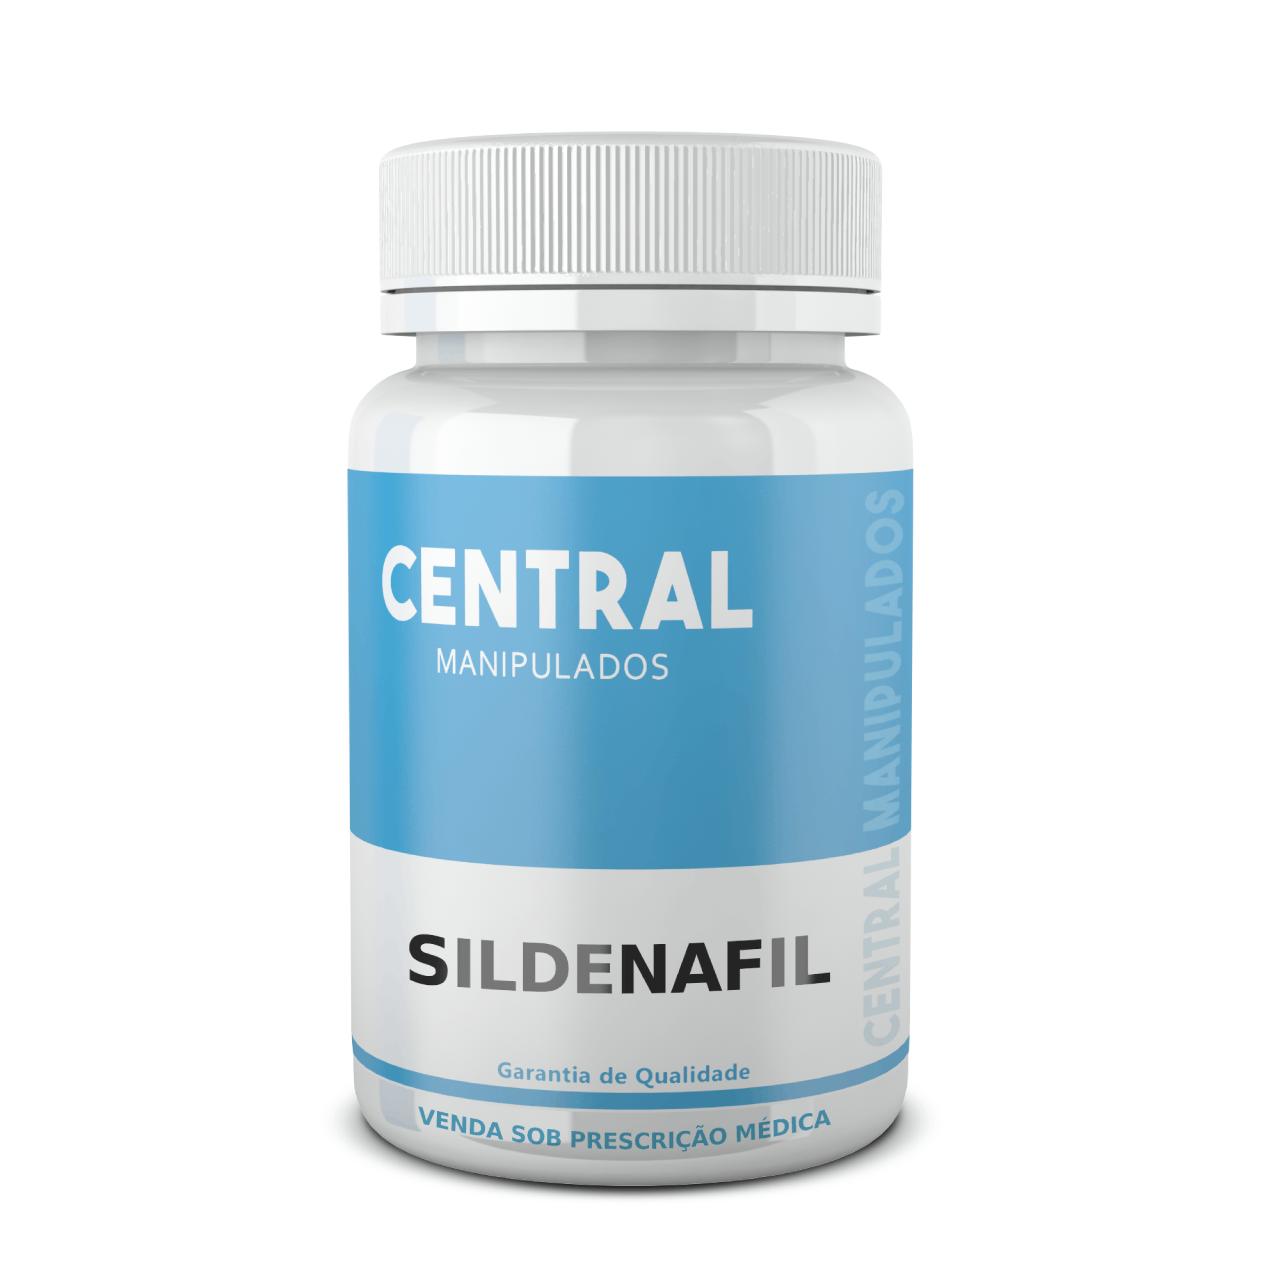 Sildenafil 50mg - 120 cápsulas - Vasodilatador